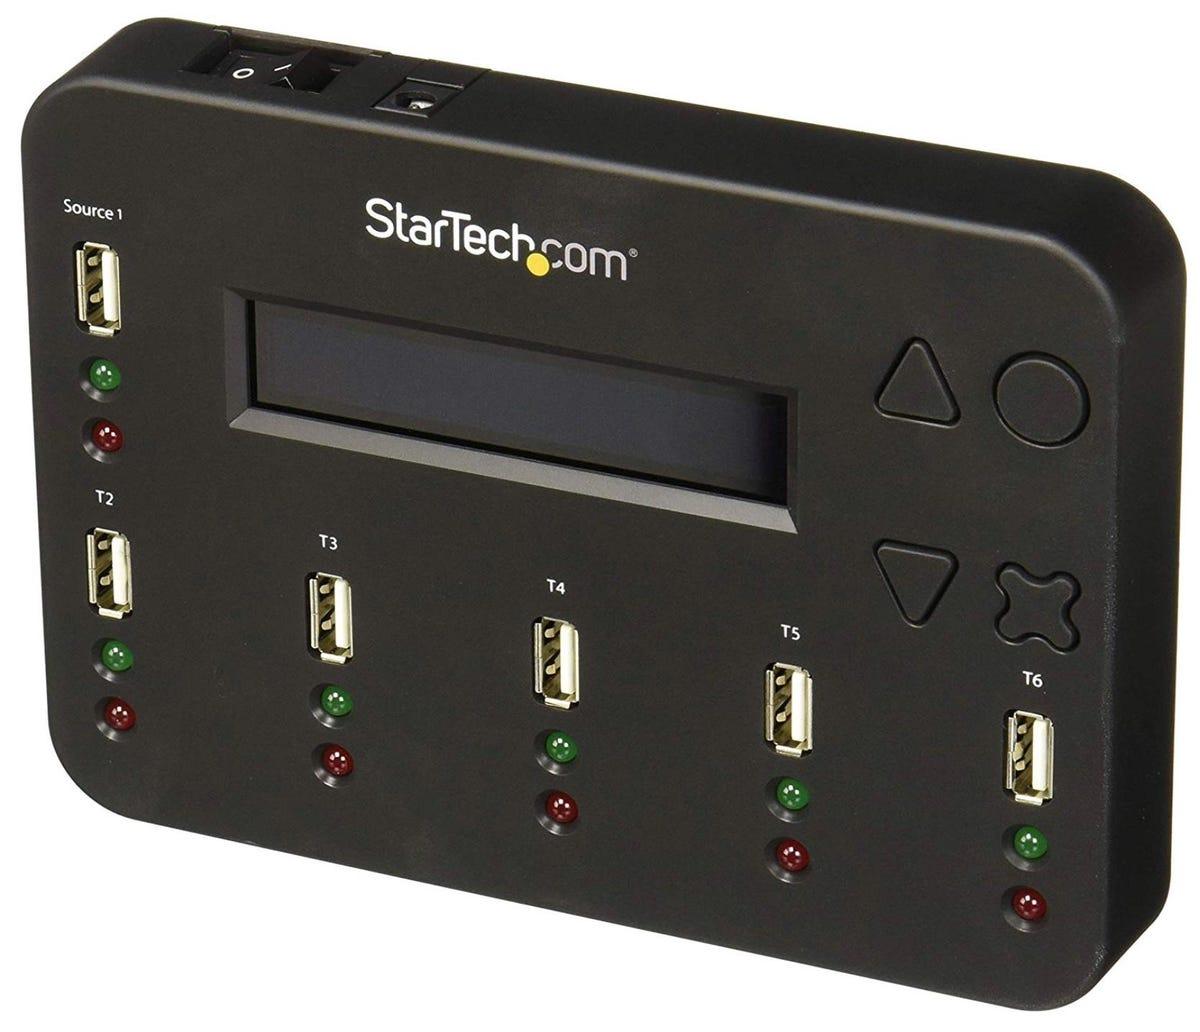 StarTech 1:5 USB flash drive duplicator and eraser